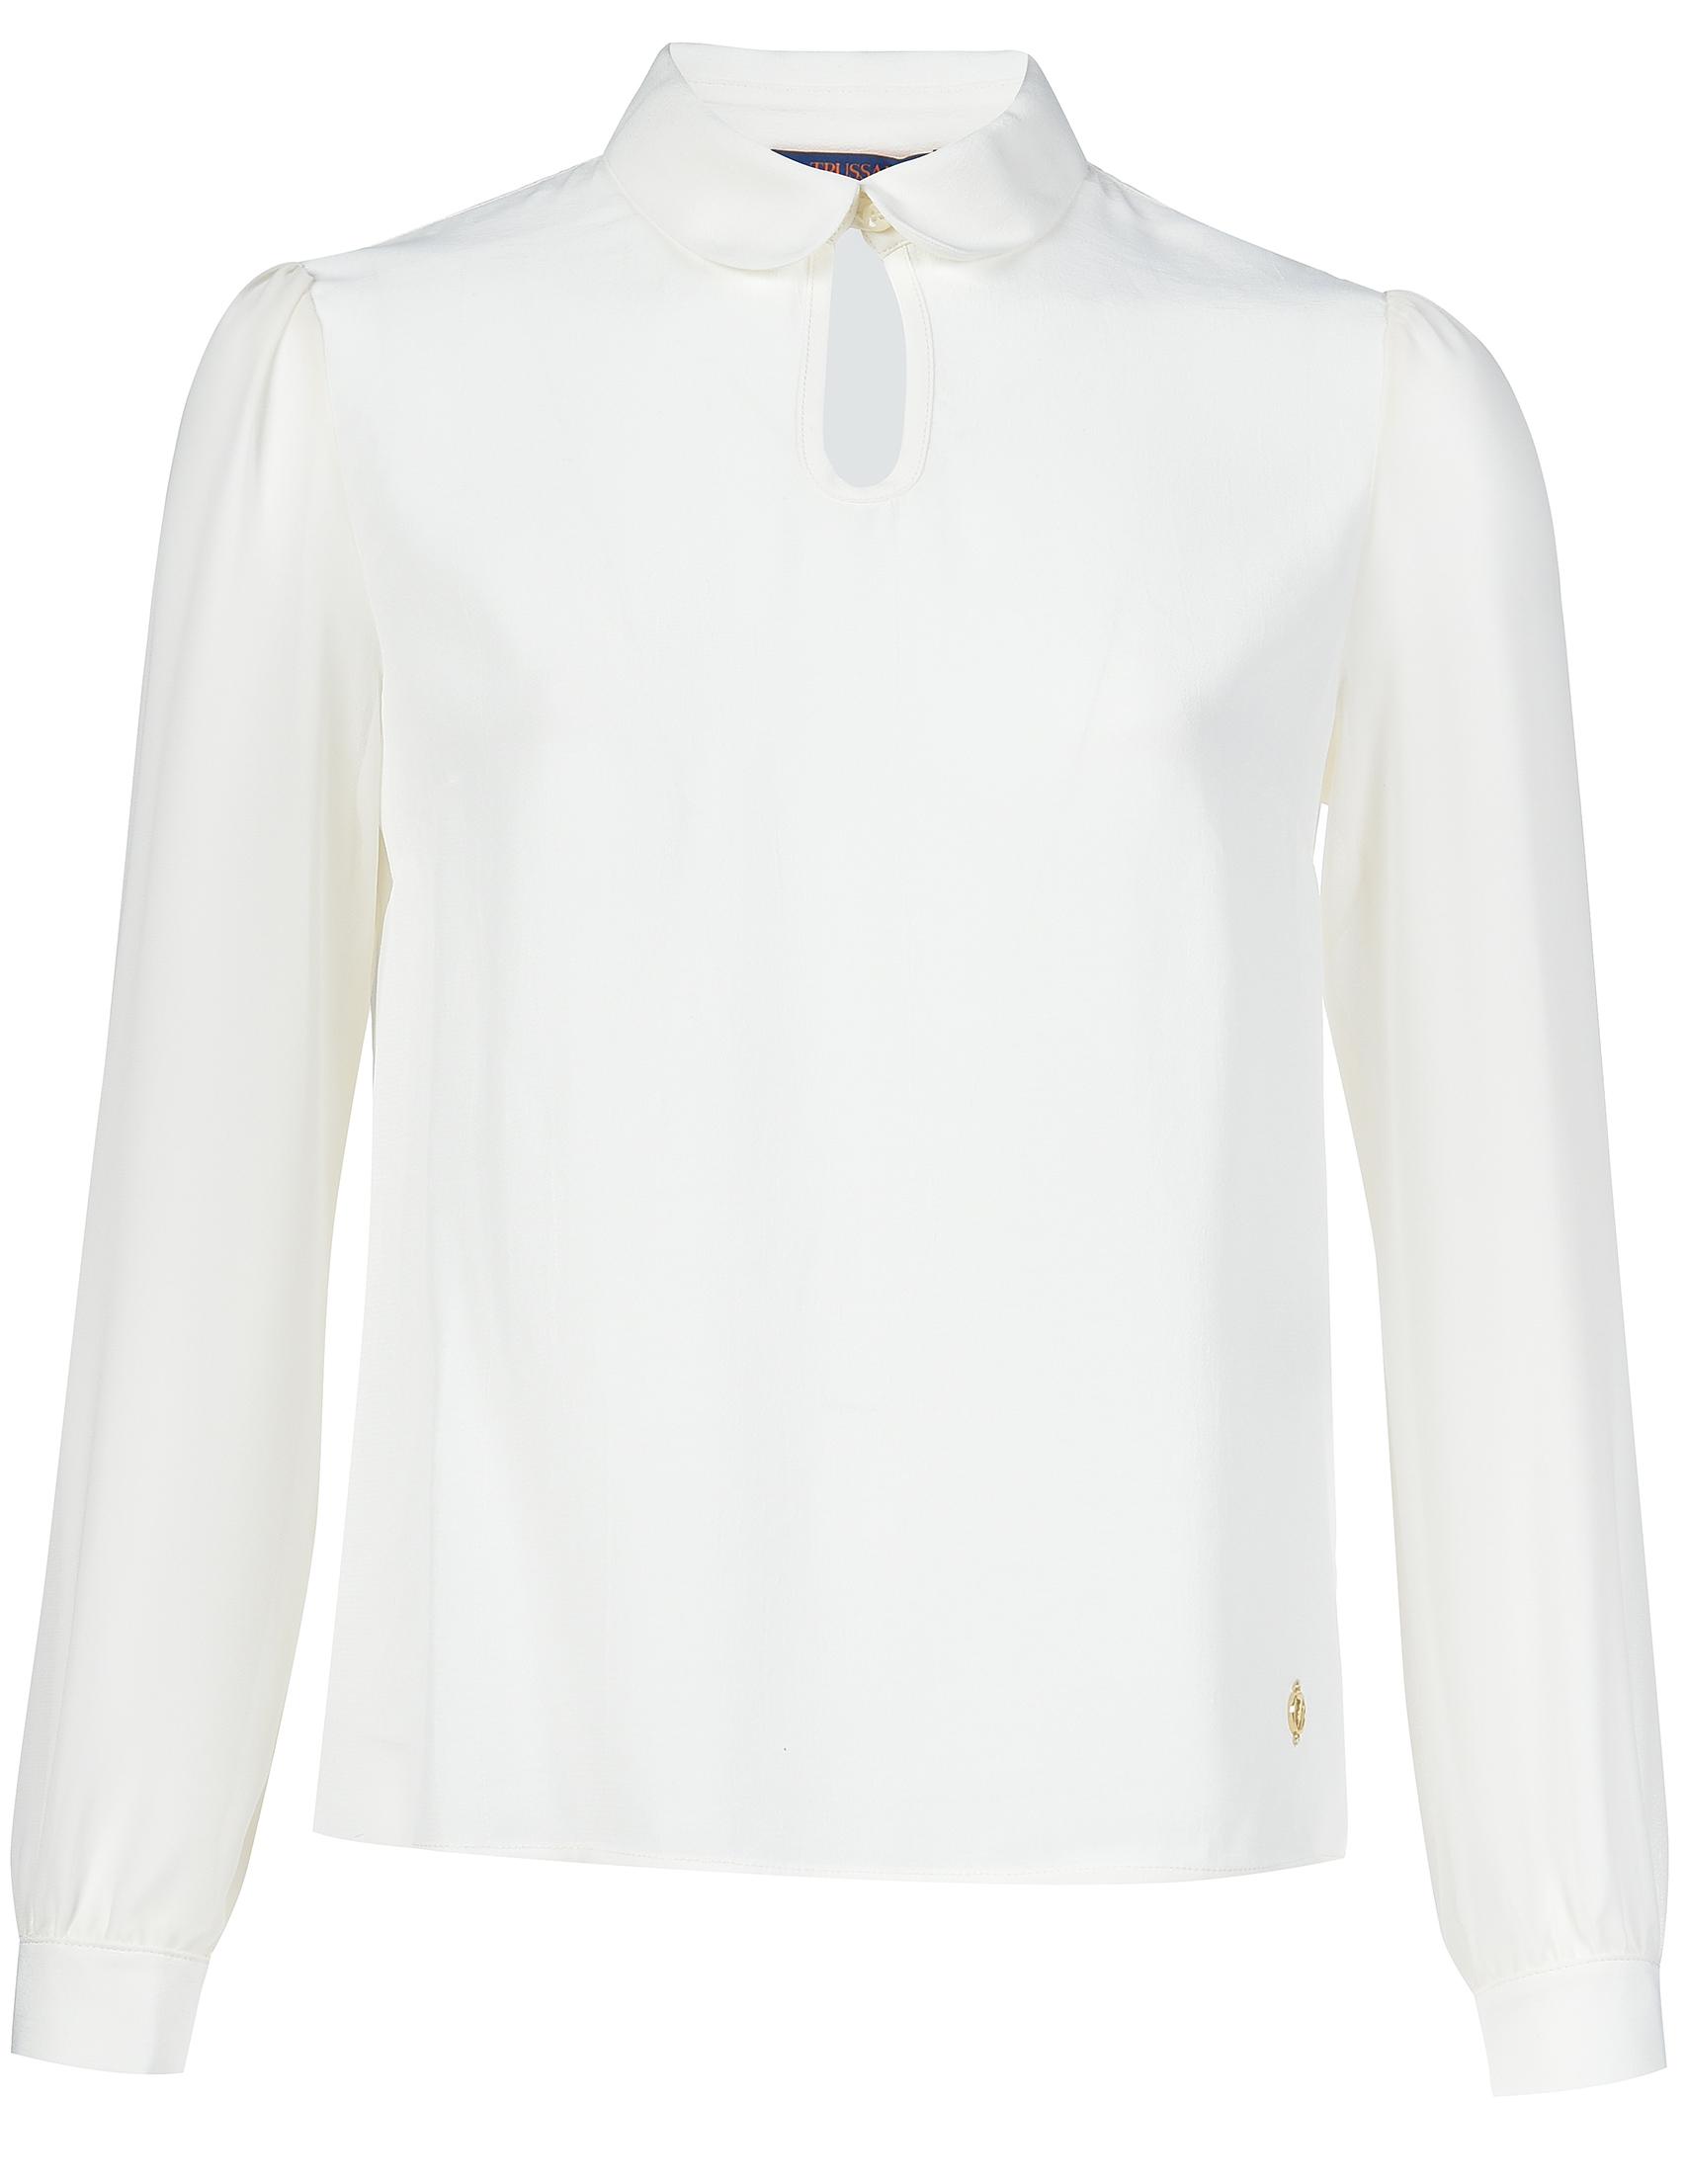 Блуза TRUSSARDI JEANS 56C001451T001504-W002